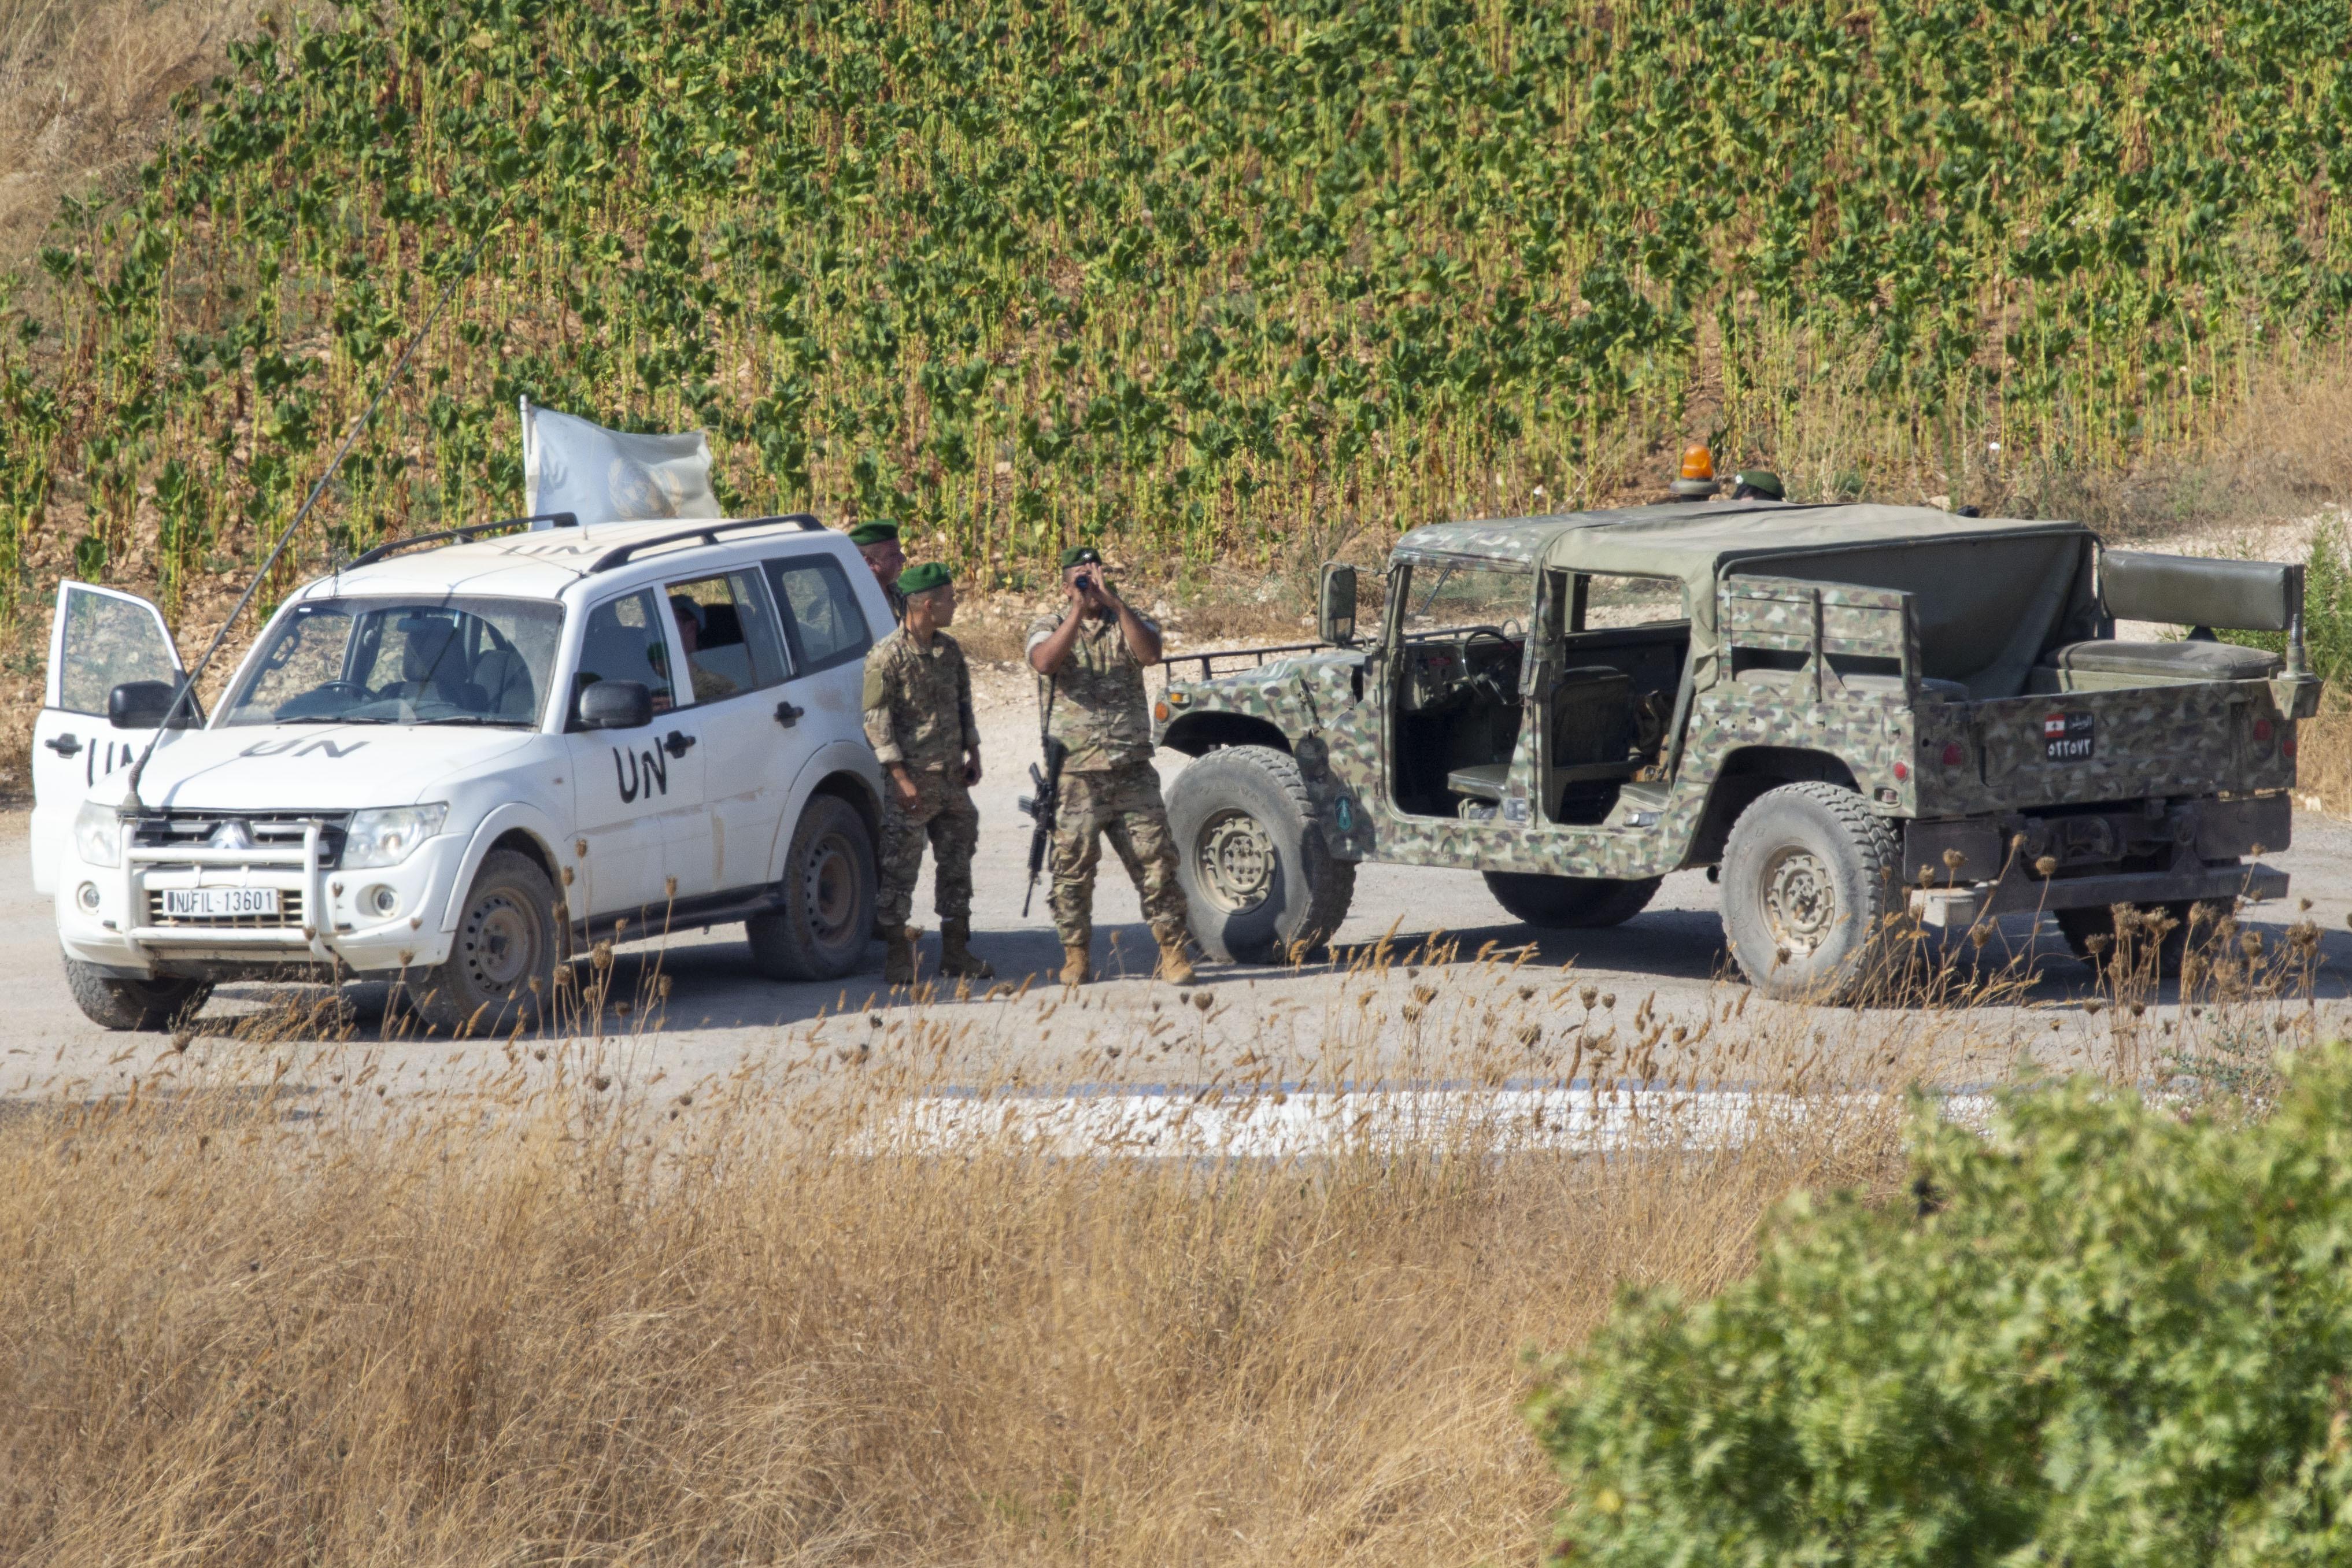 Israel: Iran, Hezbollah intensifying missile efforts